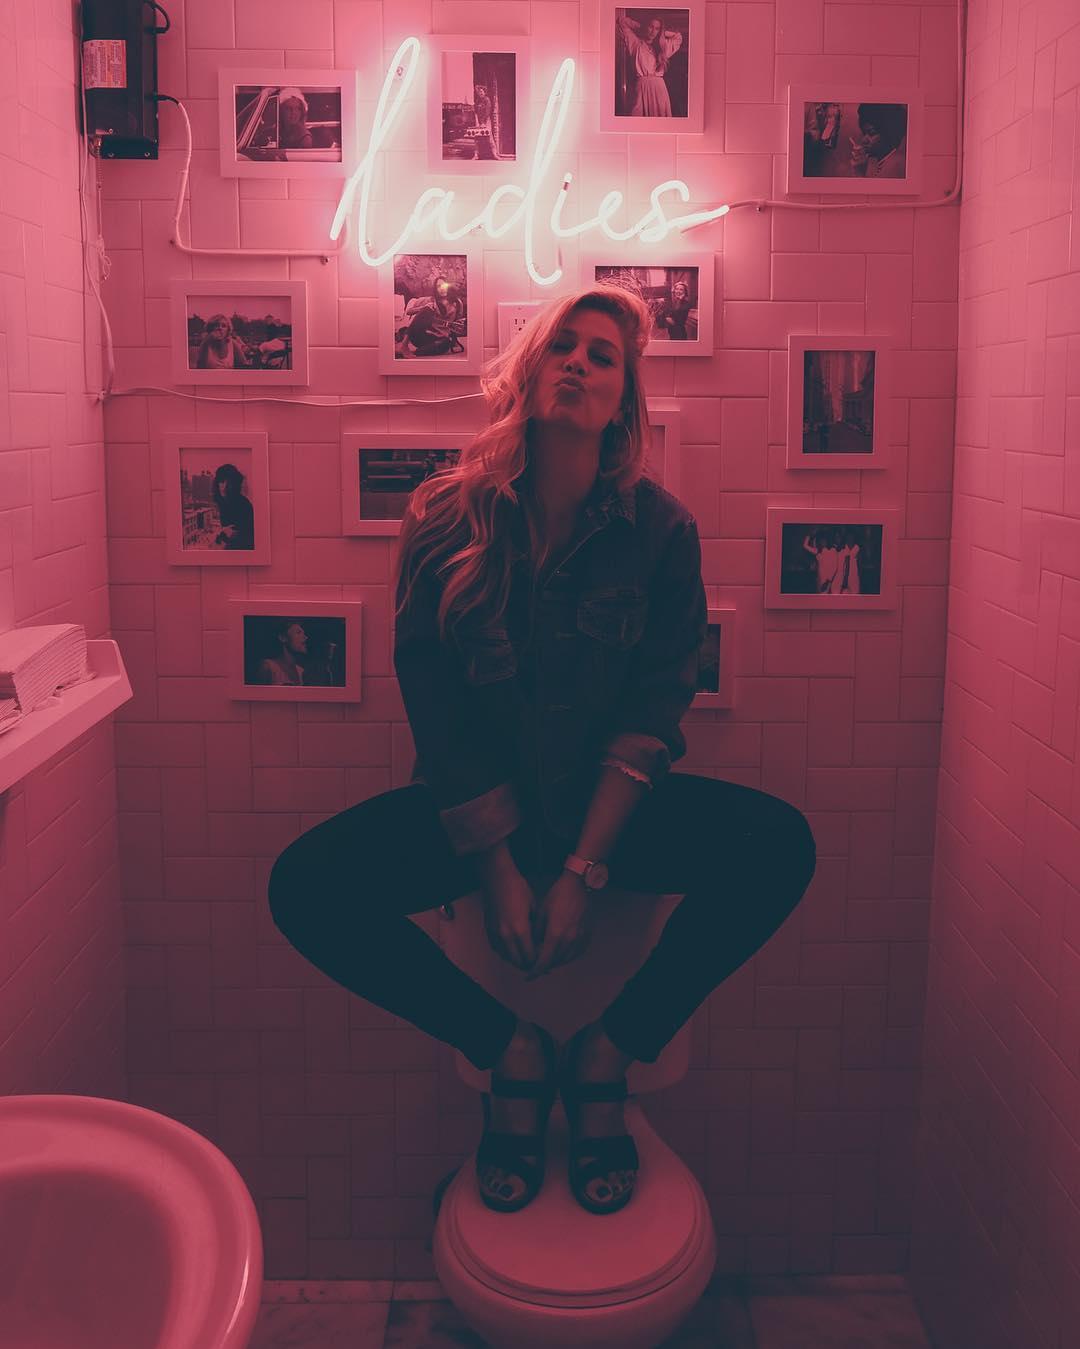 ladies neon pink sign in bathroom